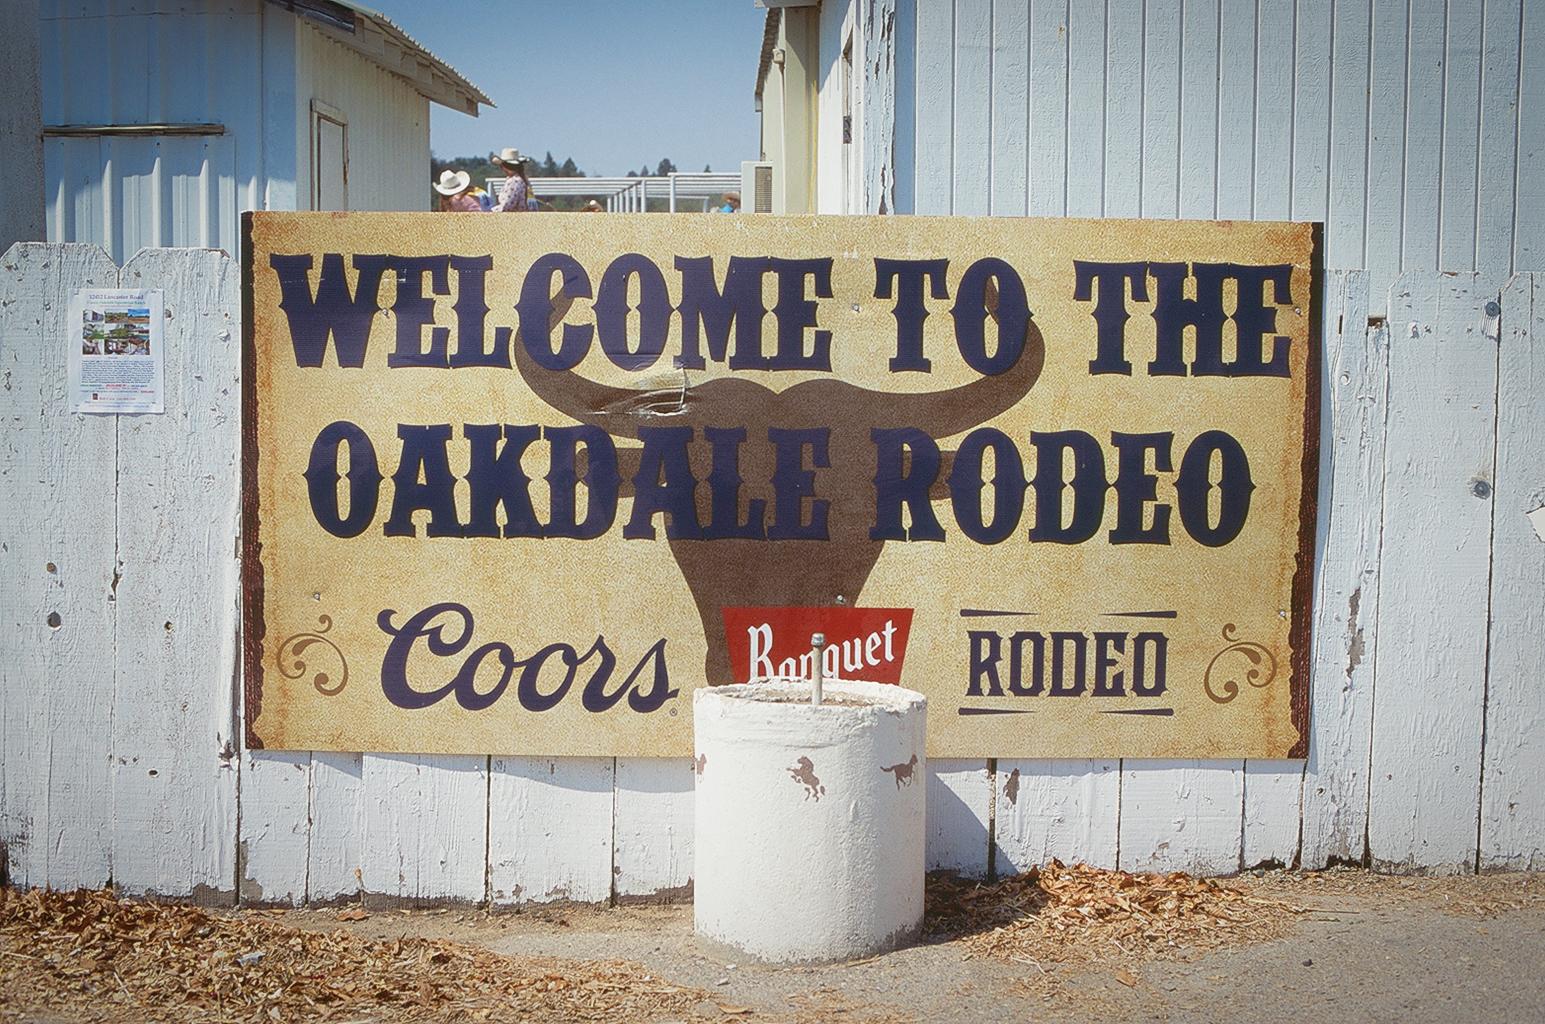 rodeo7.jpg